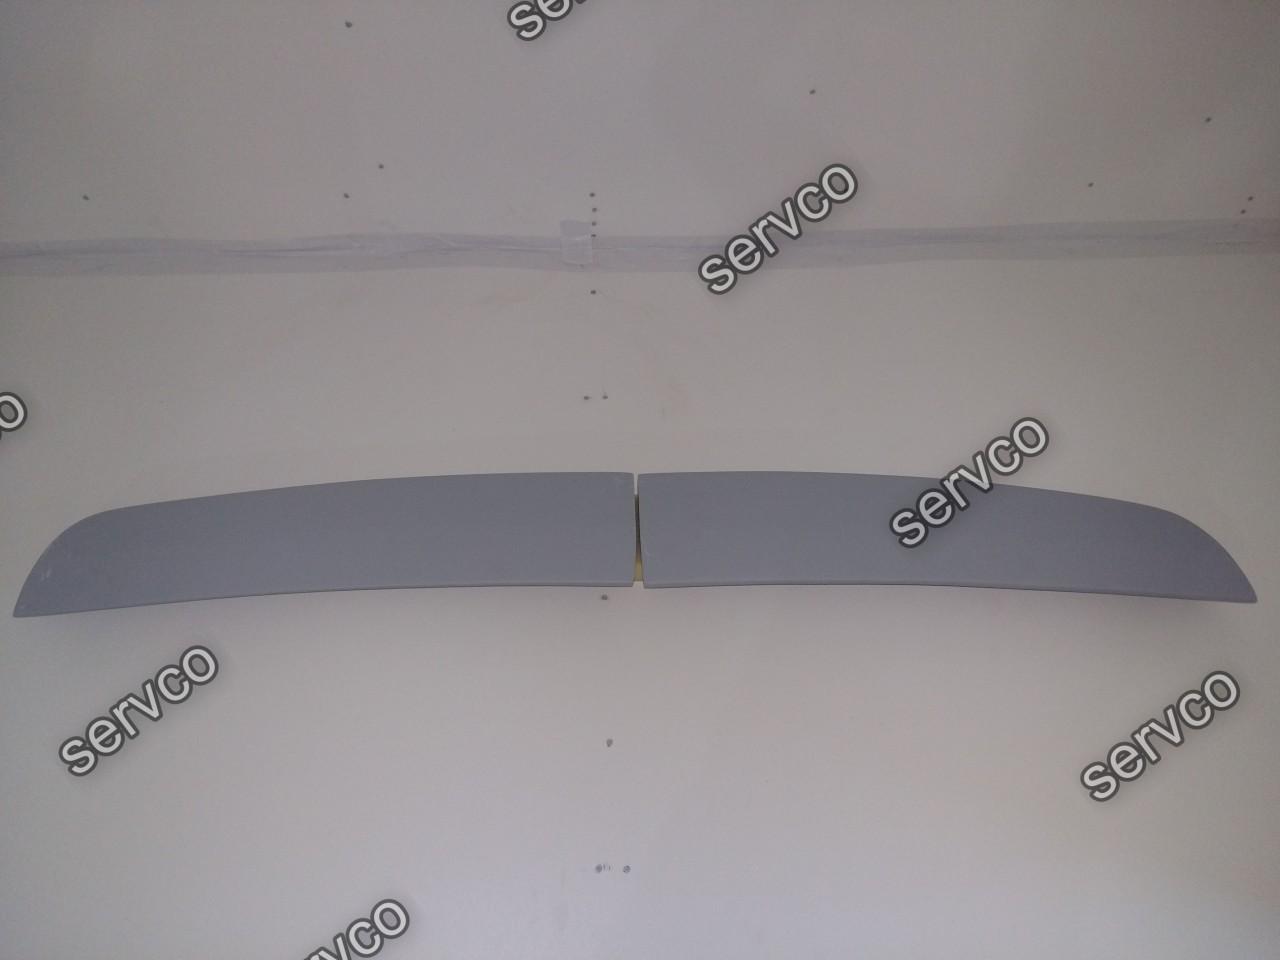 Eleron haion luneta usa usi spoiler tuning sport Renault Trafic Mk2 X83 2001-2014 v1